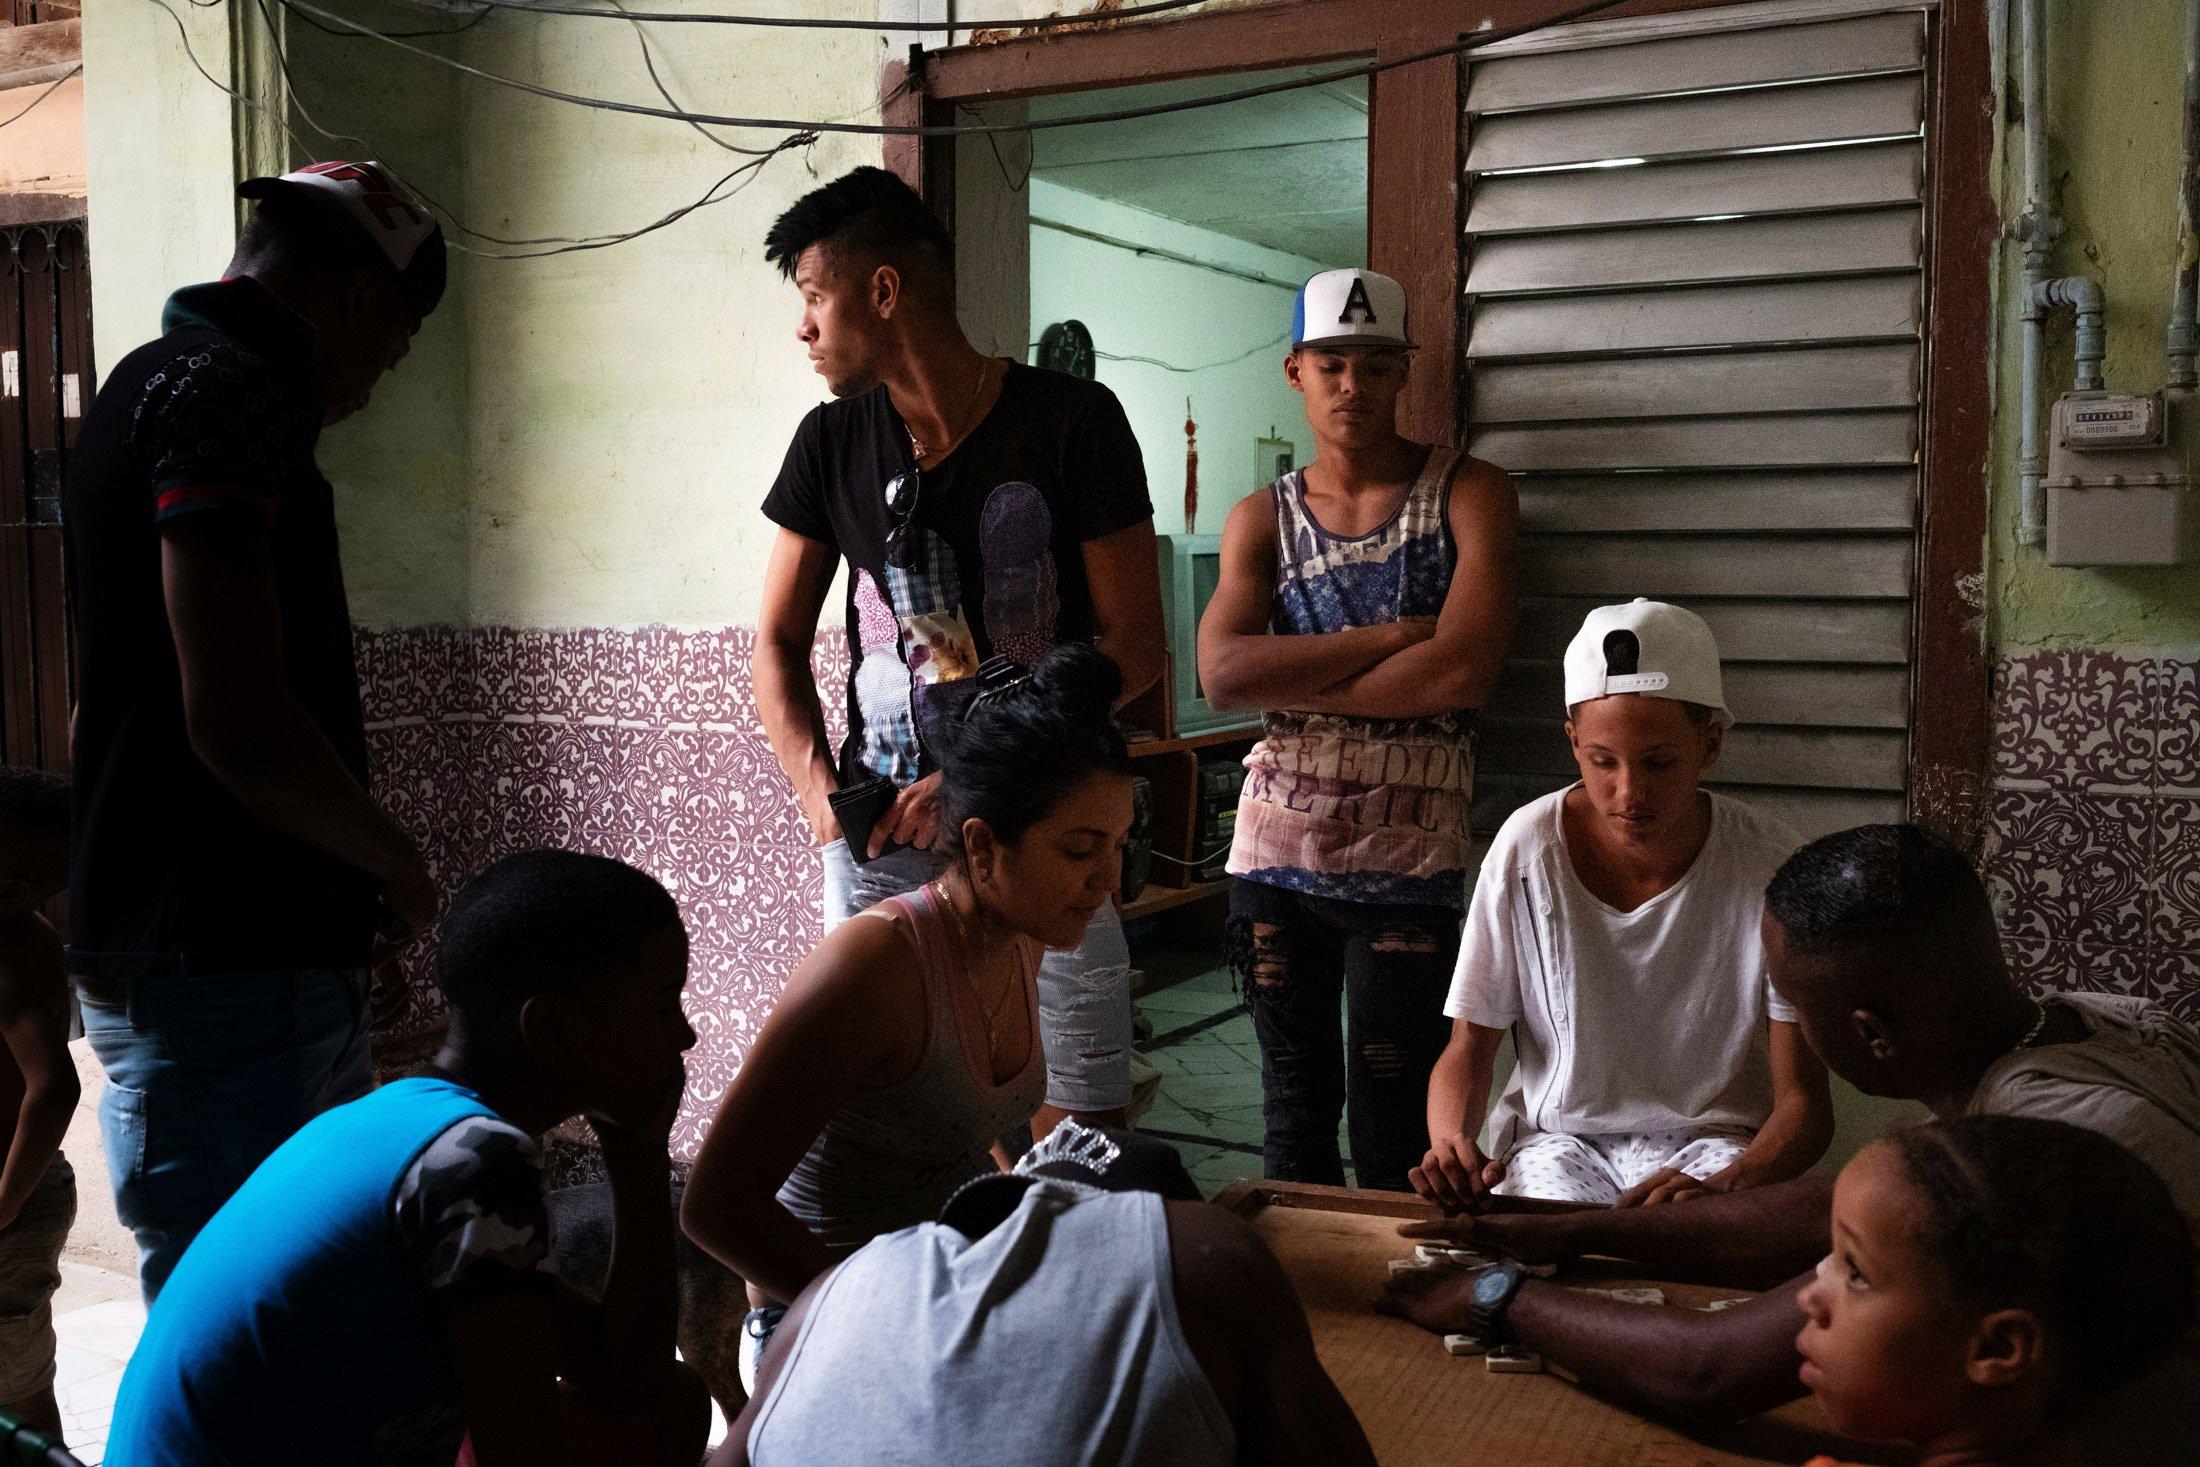 men playing dominos in their house in Havana, Cuba